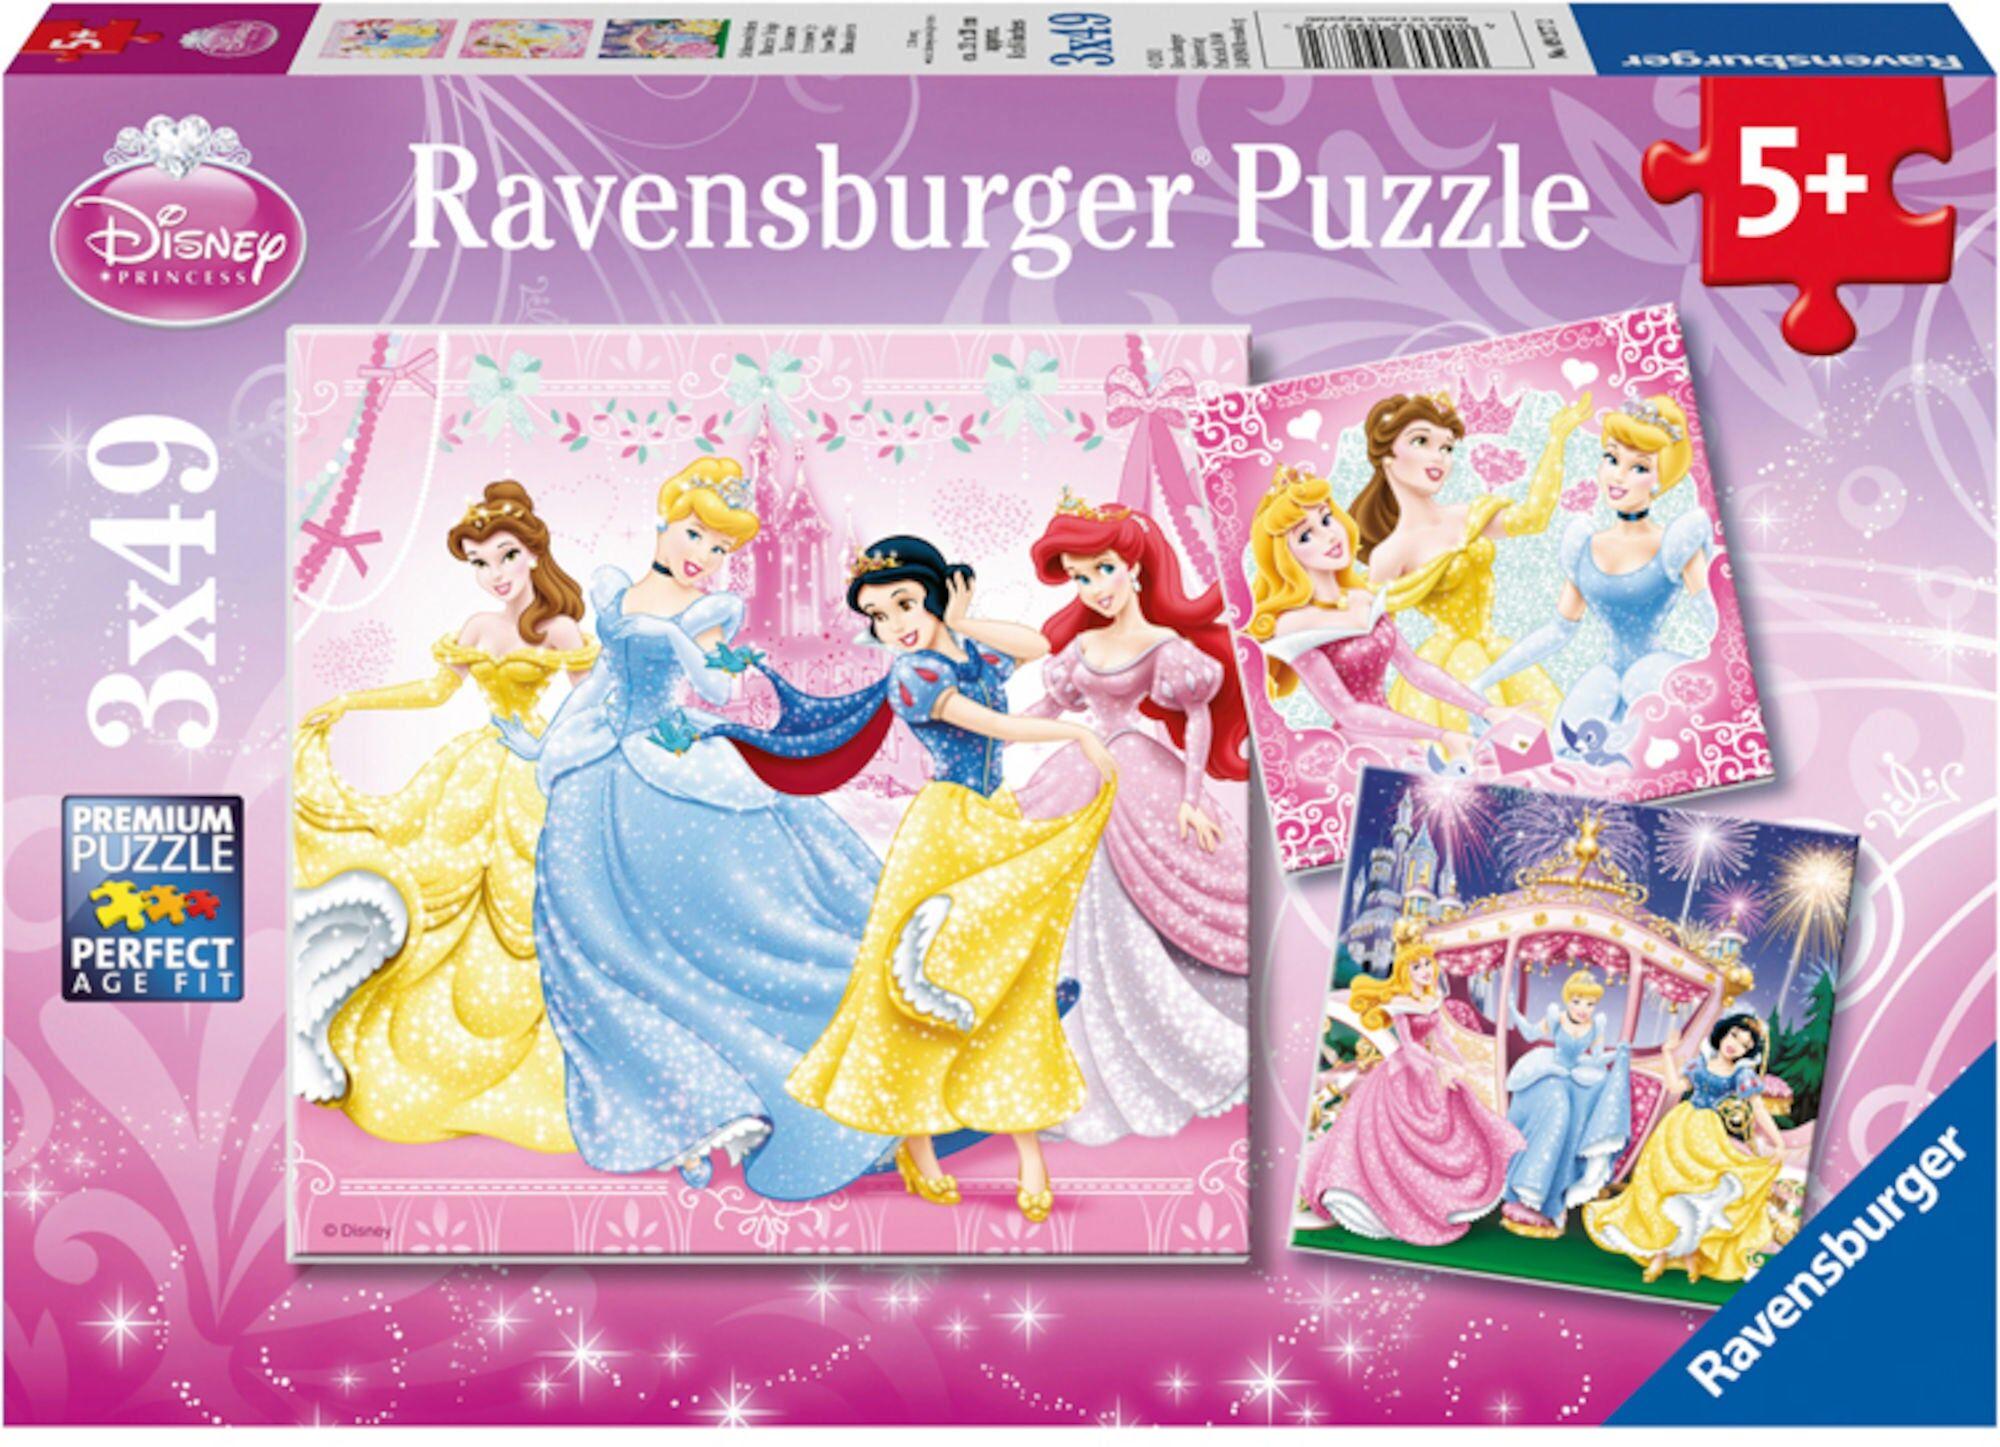 Disney Ravensburger Disney Princess Puslespill